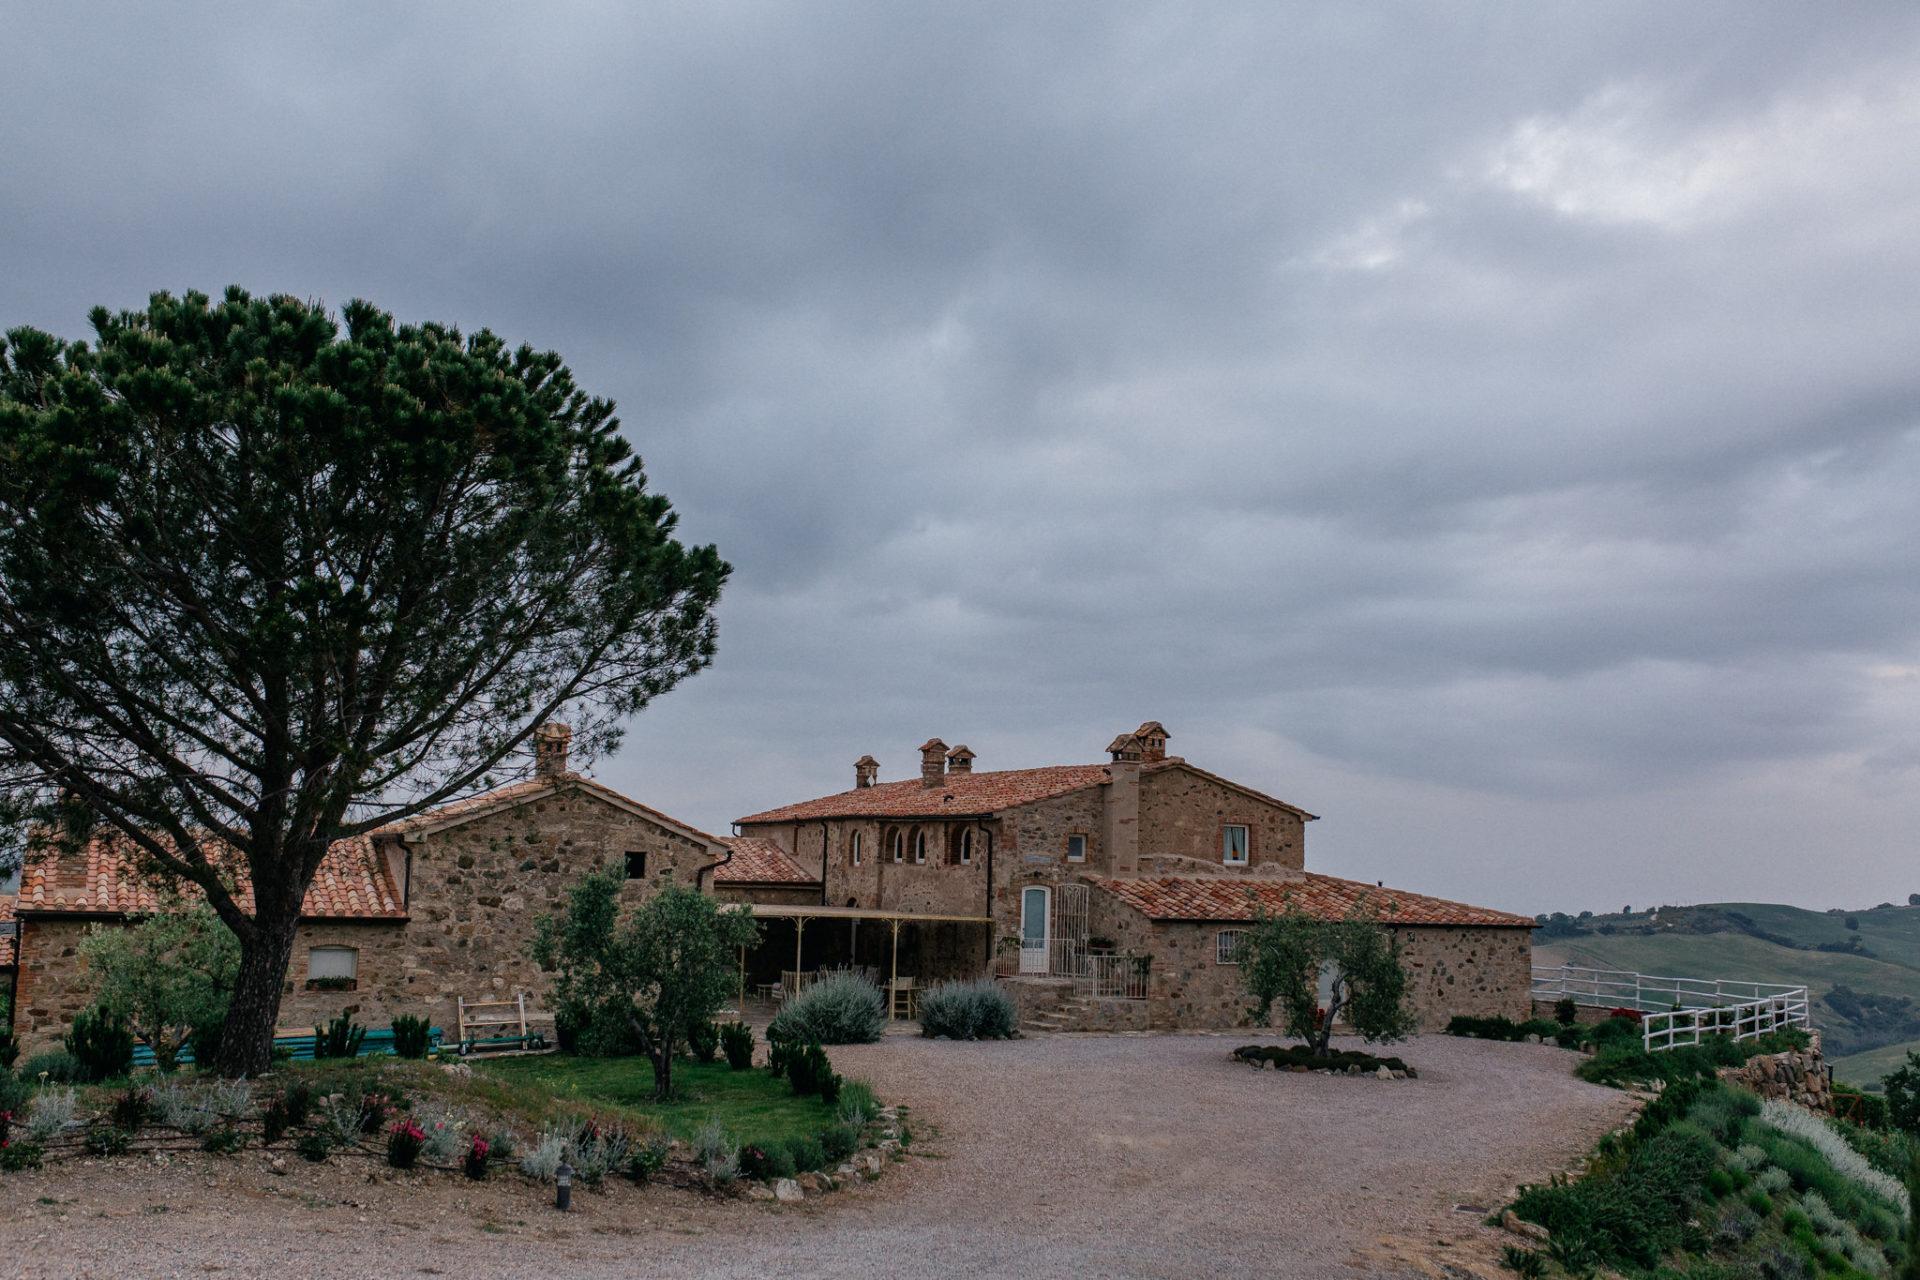 wedding photographer tuscany-italy road trip with dog-boutique hotel-exclusive romantic gateway-grosseto region-tuscan destination wedding